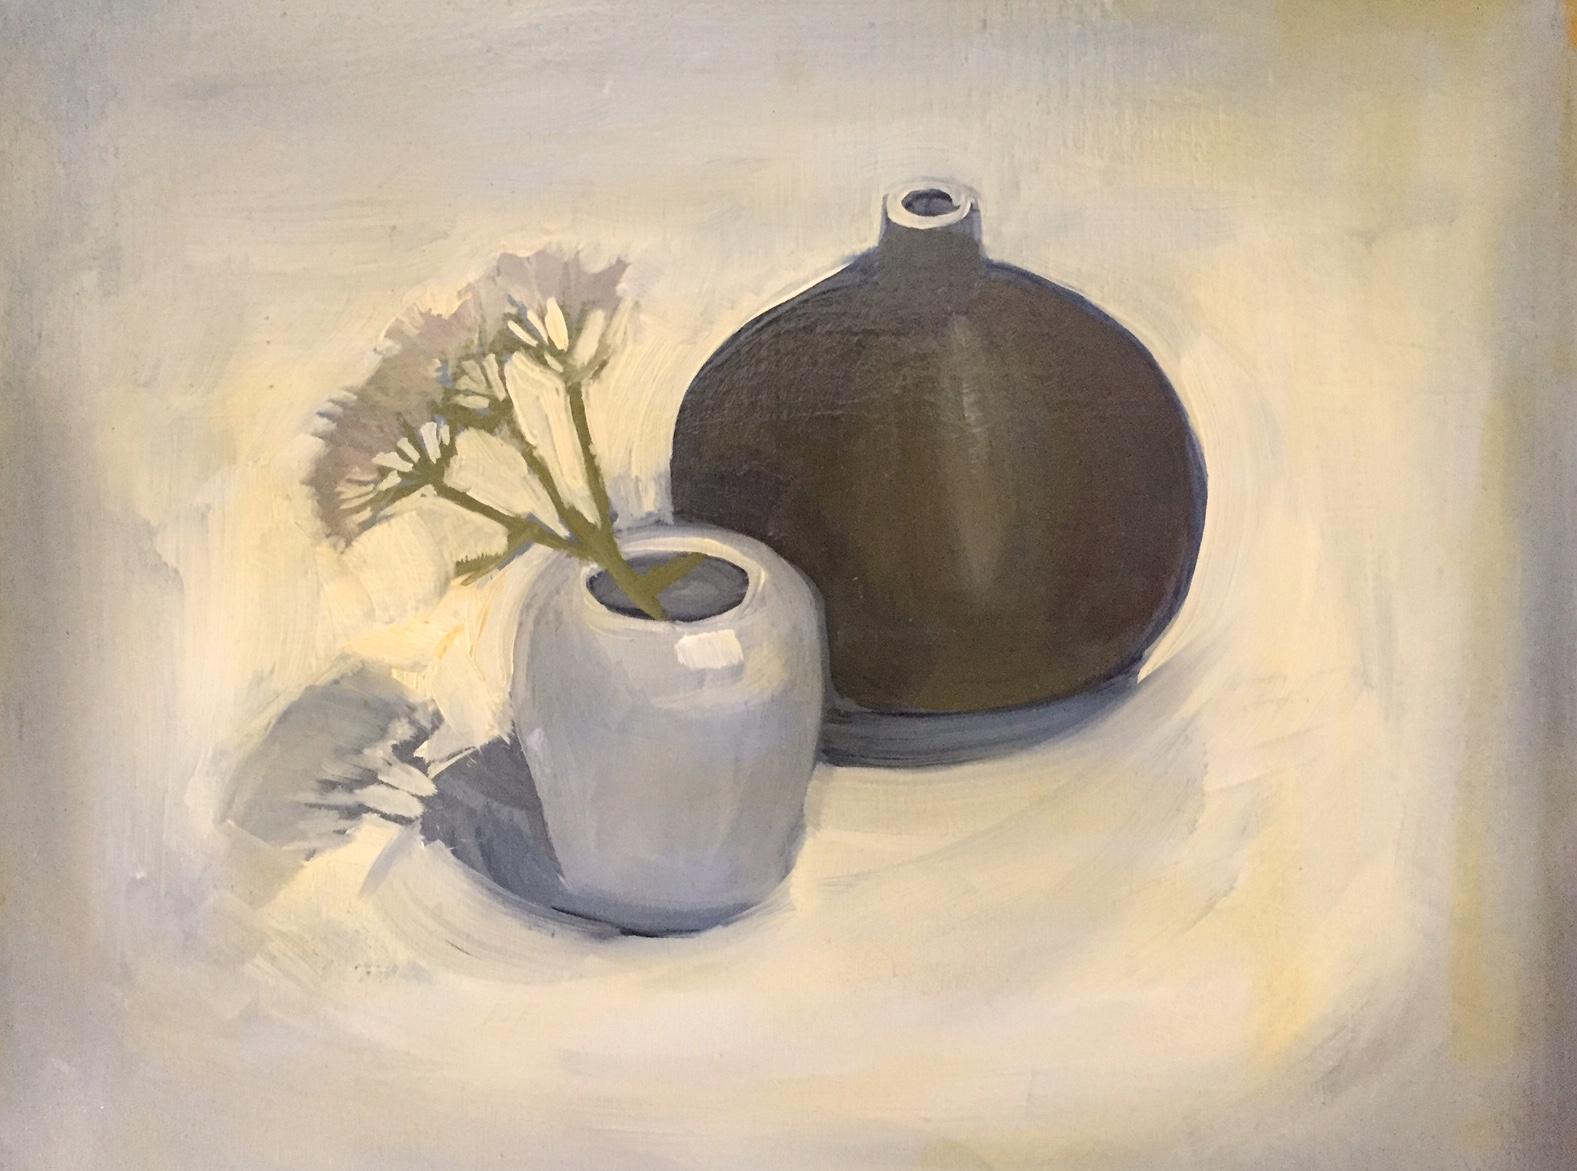 sedum and vase.JPG